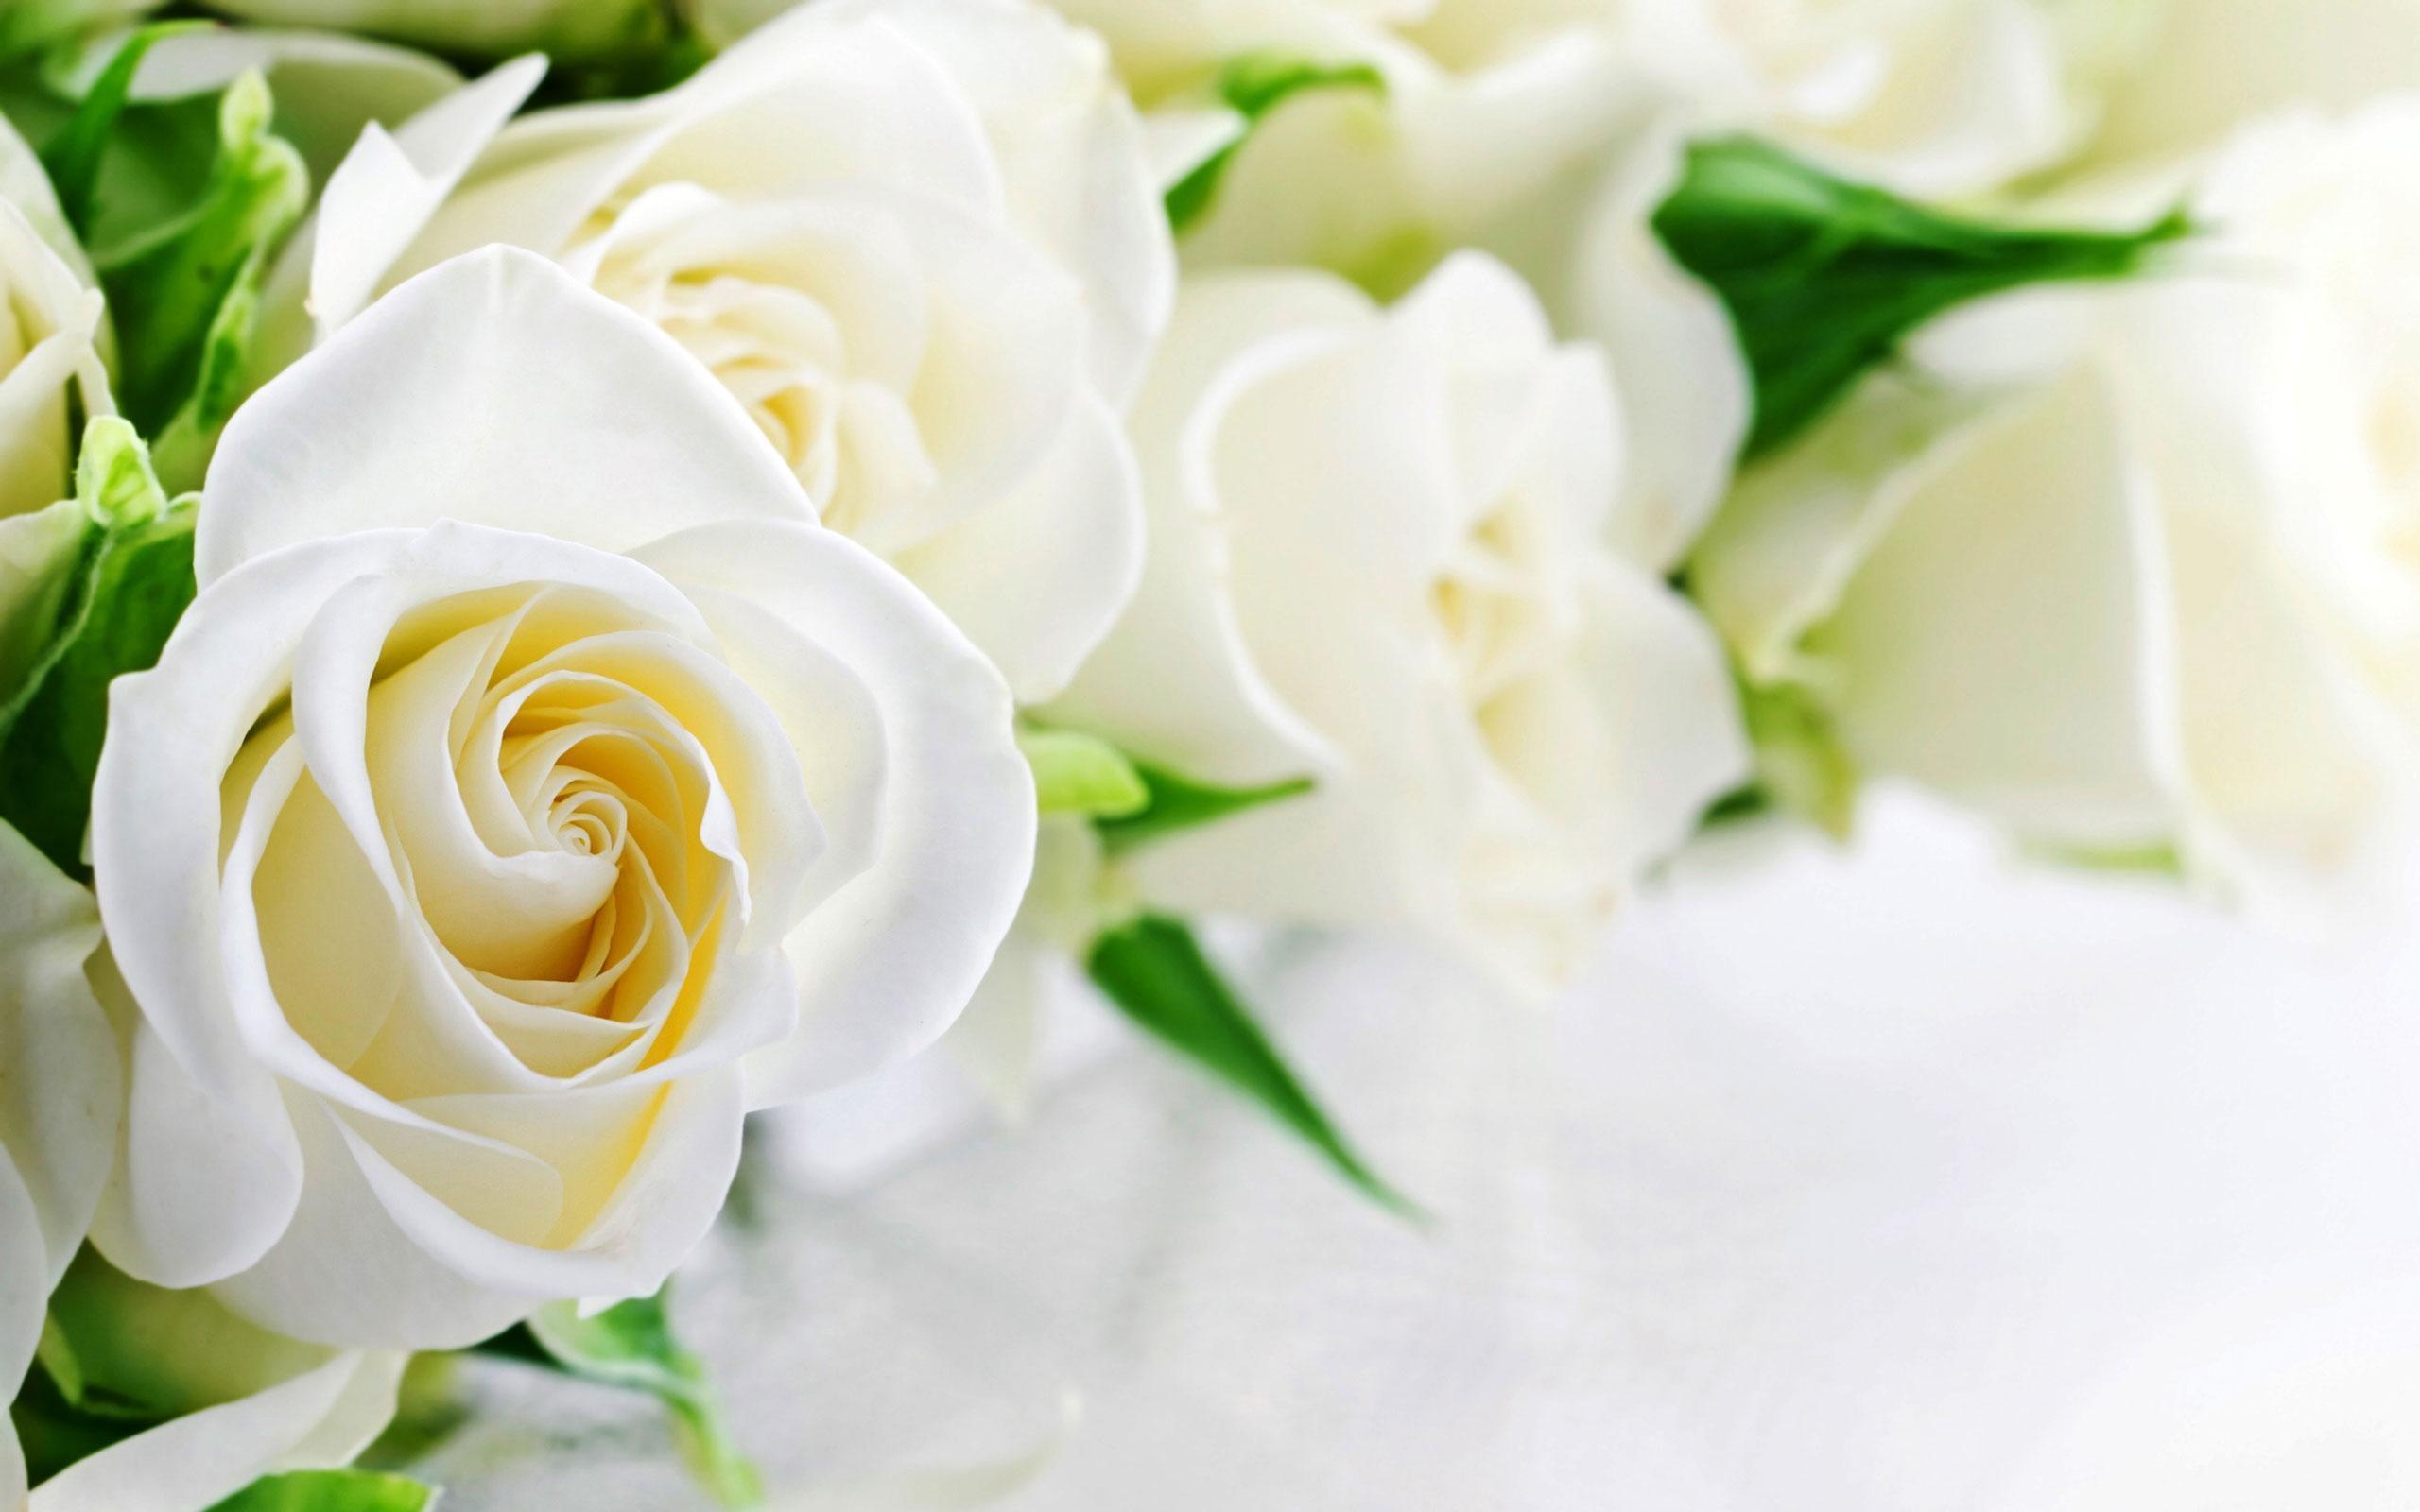 Hoa hồng trắng background